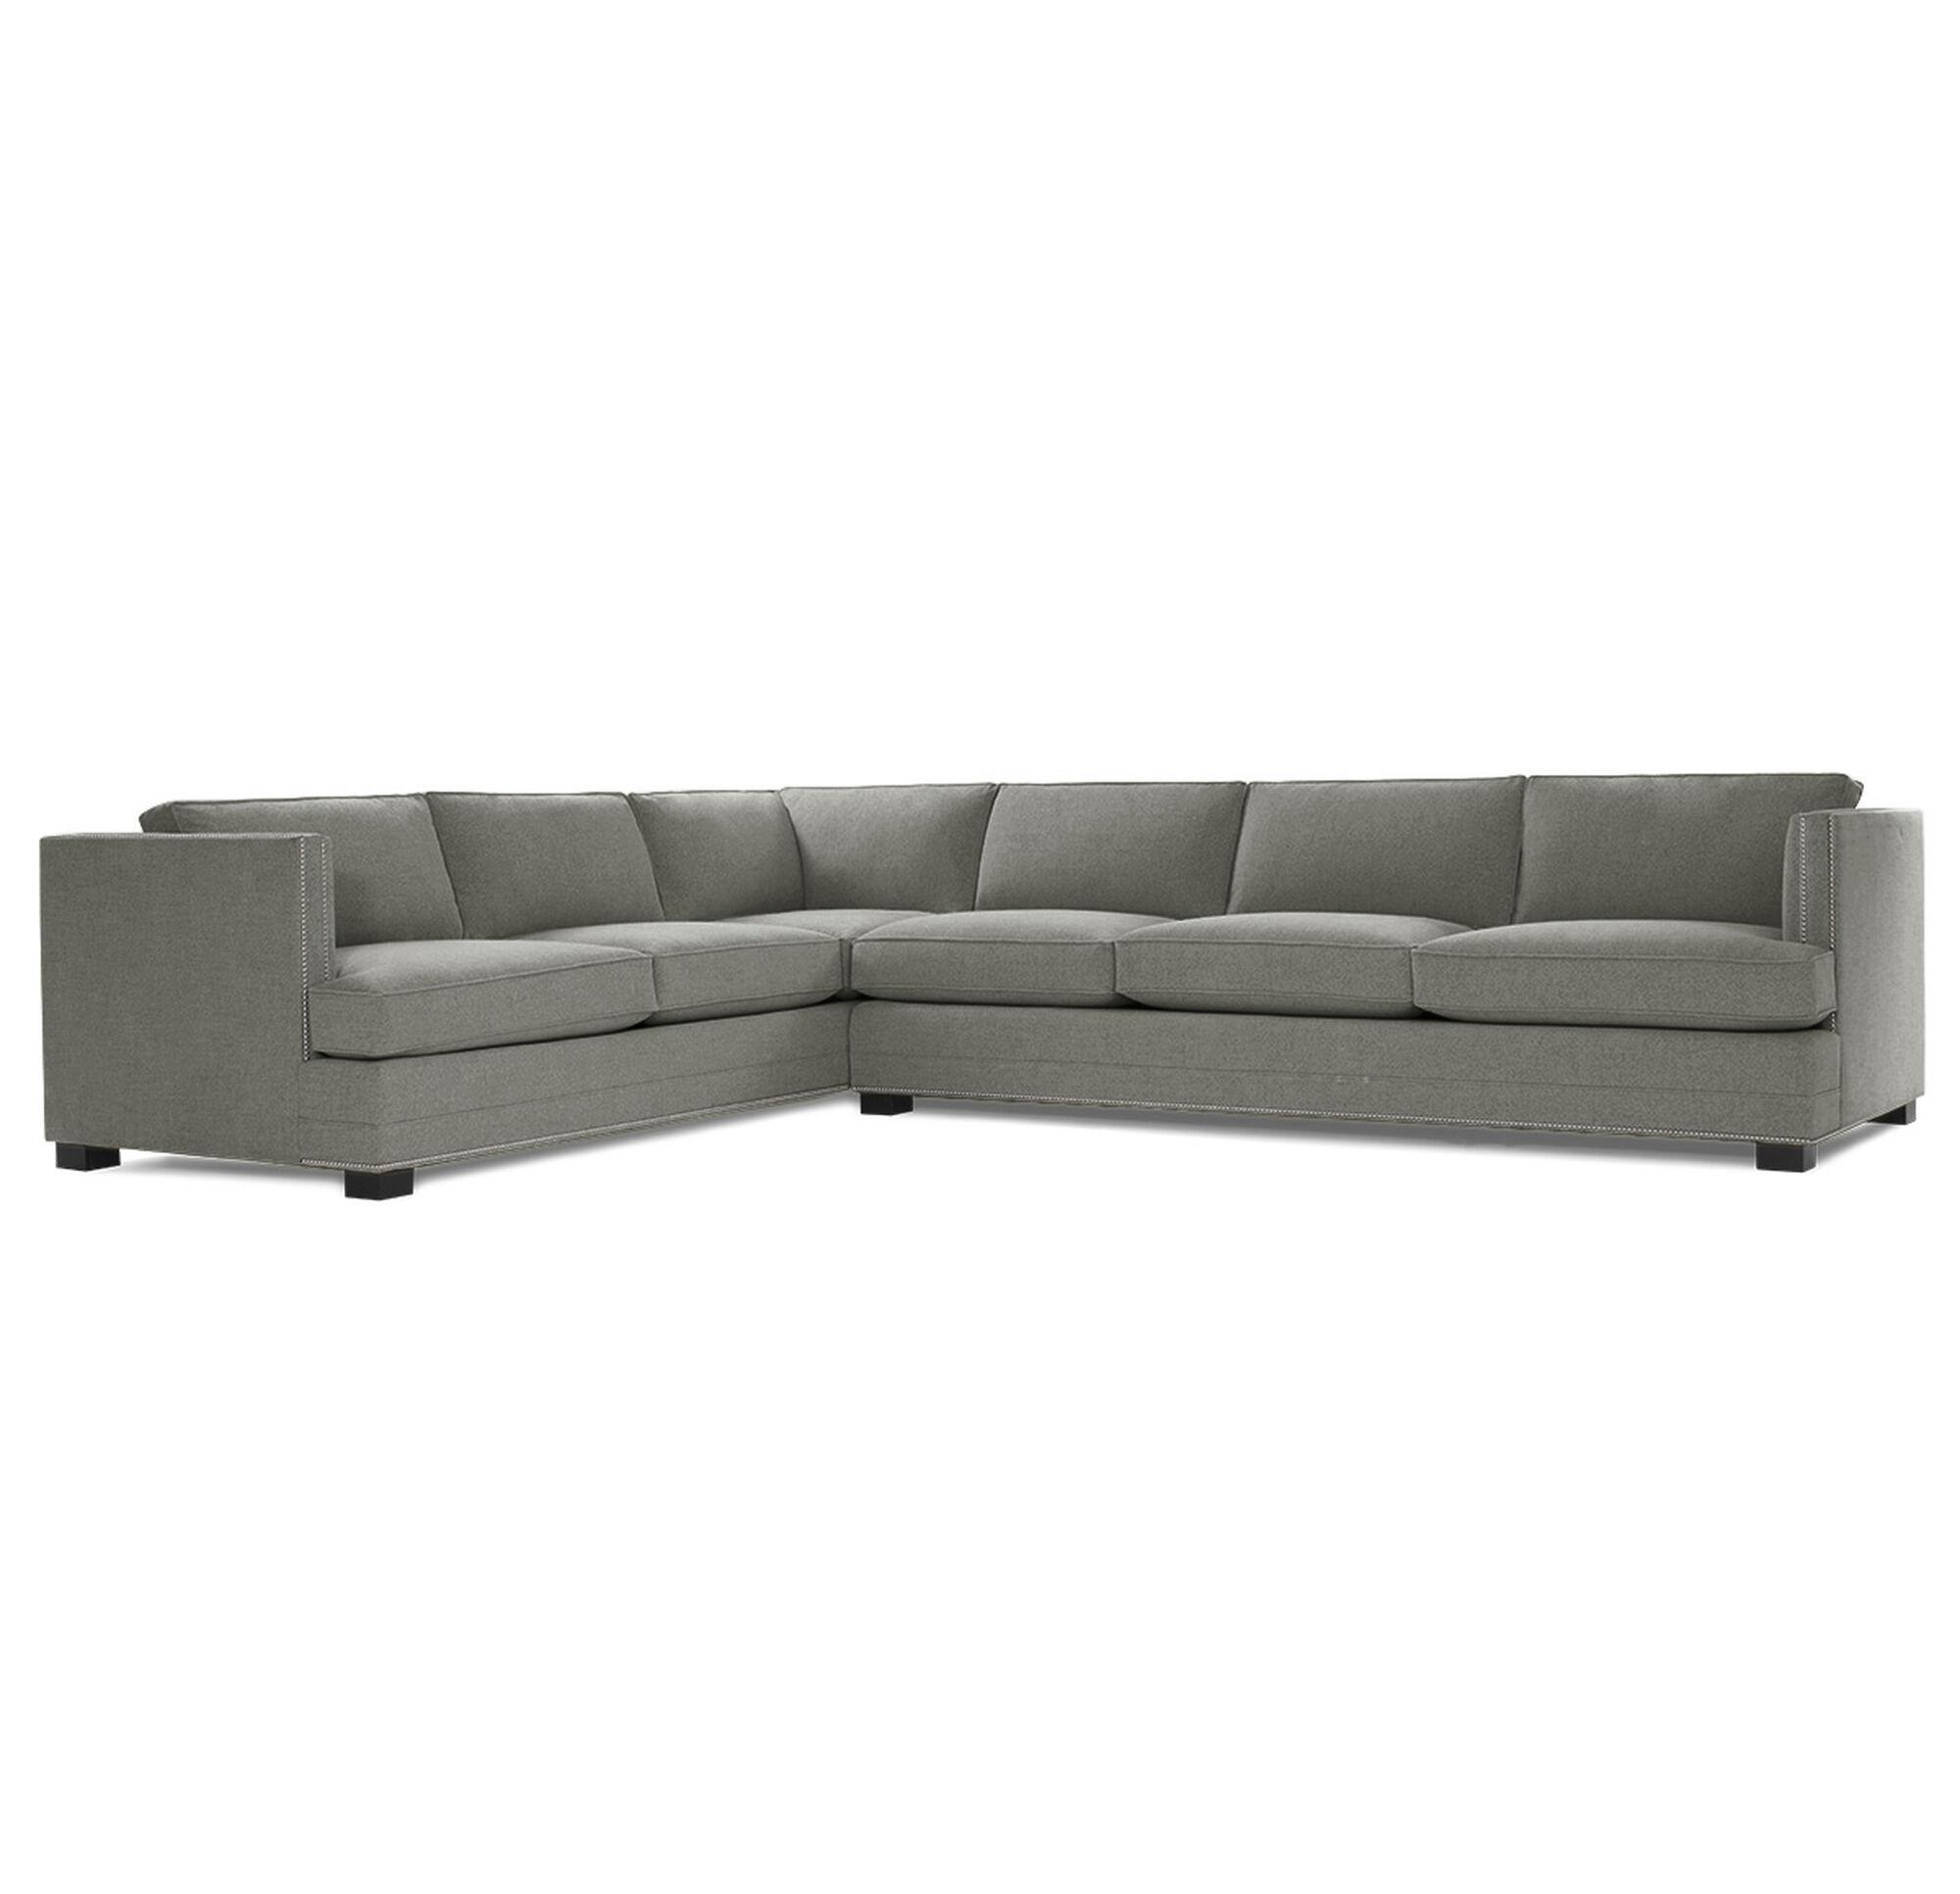 Keaton Nailhead Trim Right Sectional Sofa Hi Res